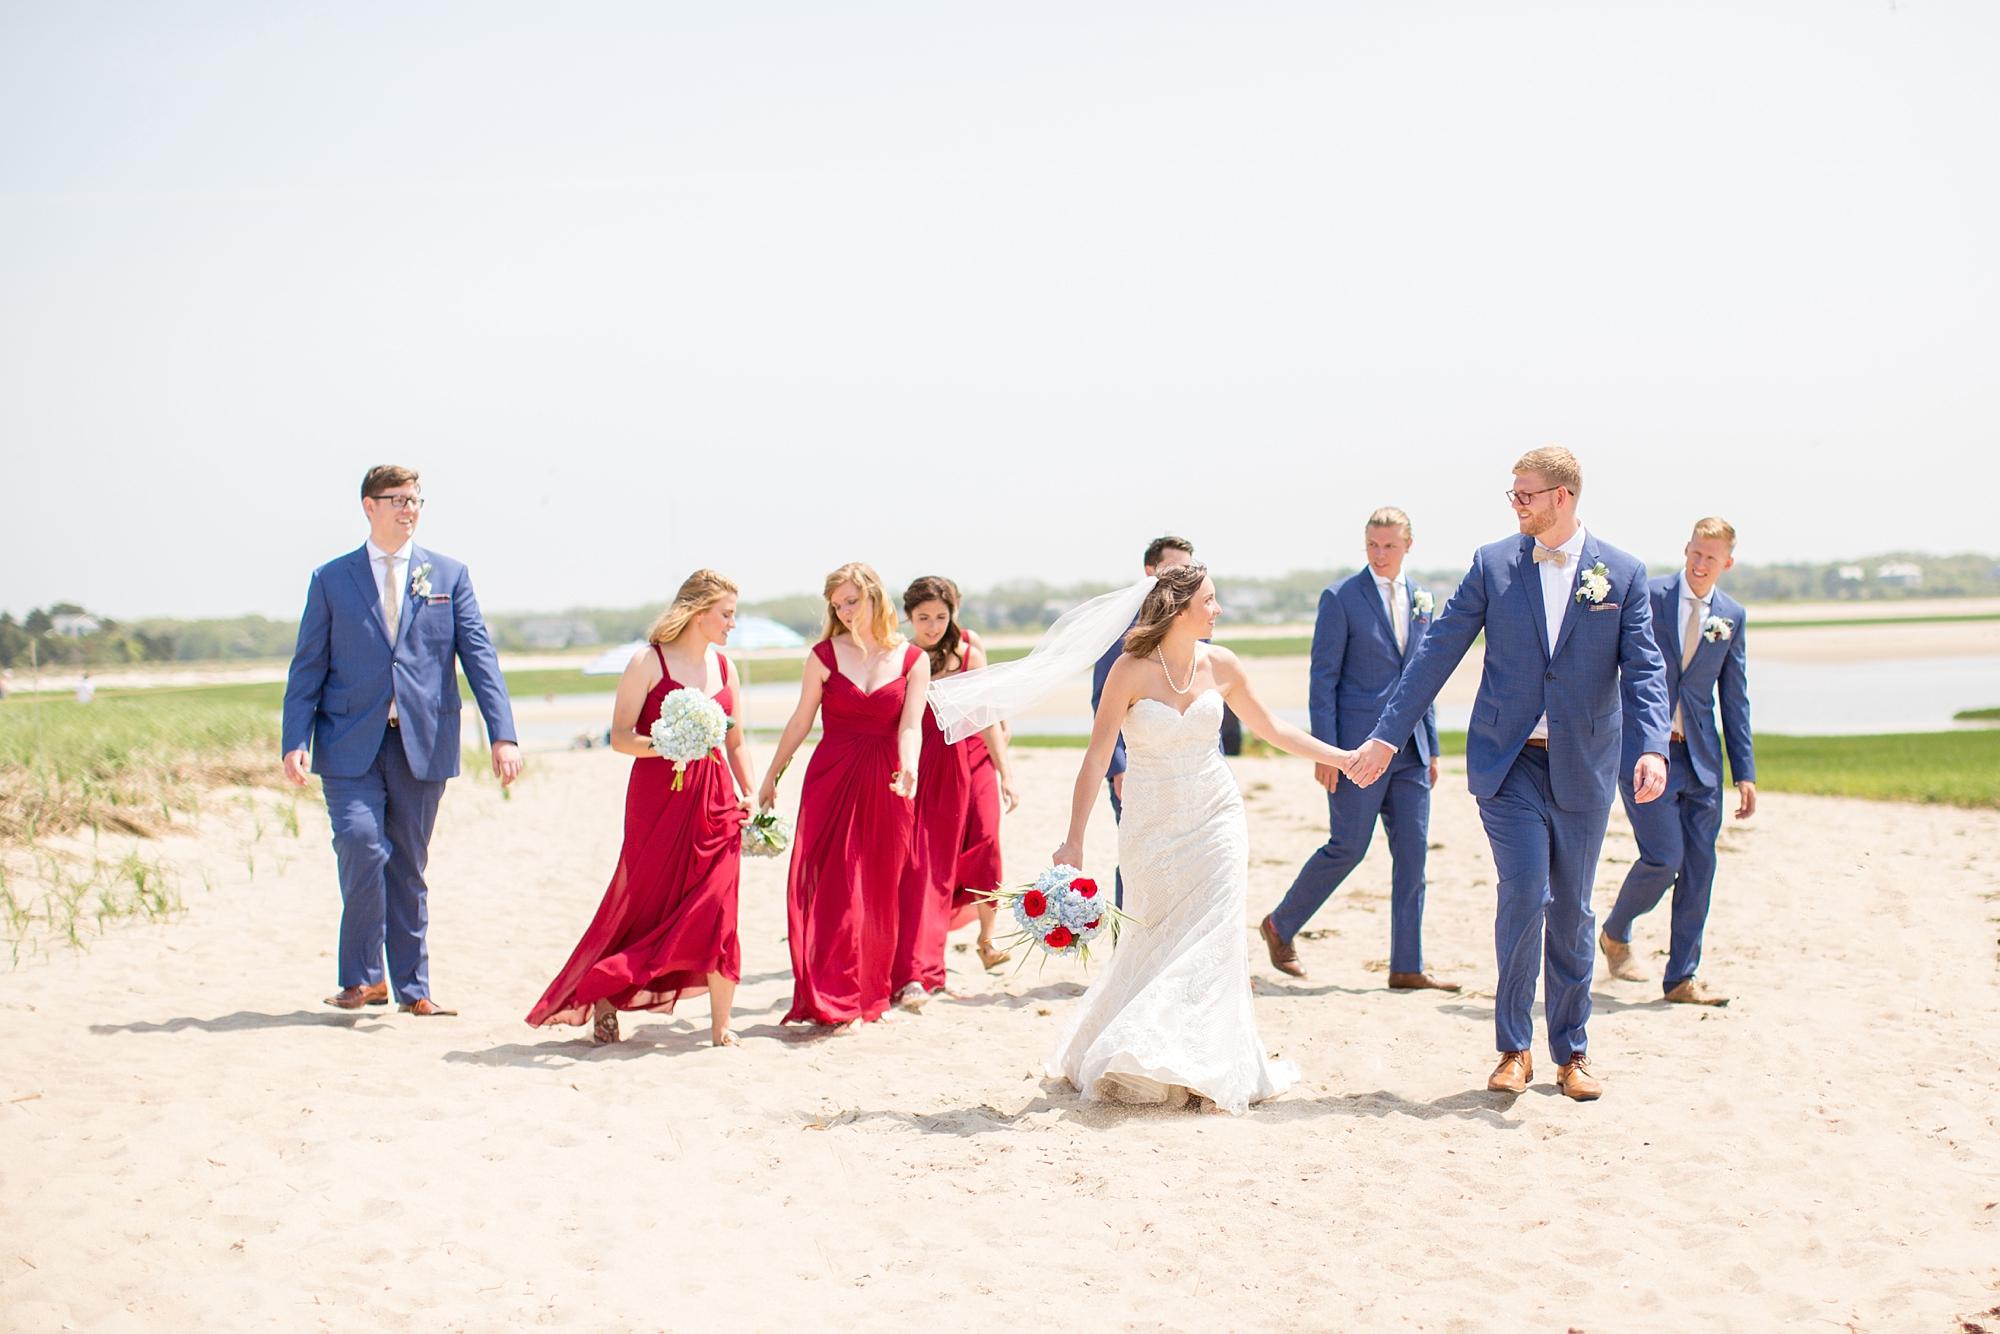 Goodman 4-Bridal Party-363_anna grace photography wellfleet cape cod massachusetts destination wedding photographer Chequessett Yacht and Country Club wedding photo.jpg